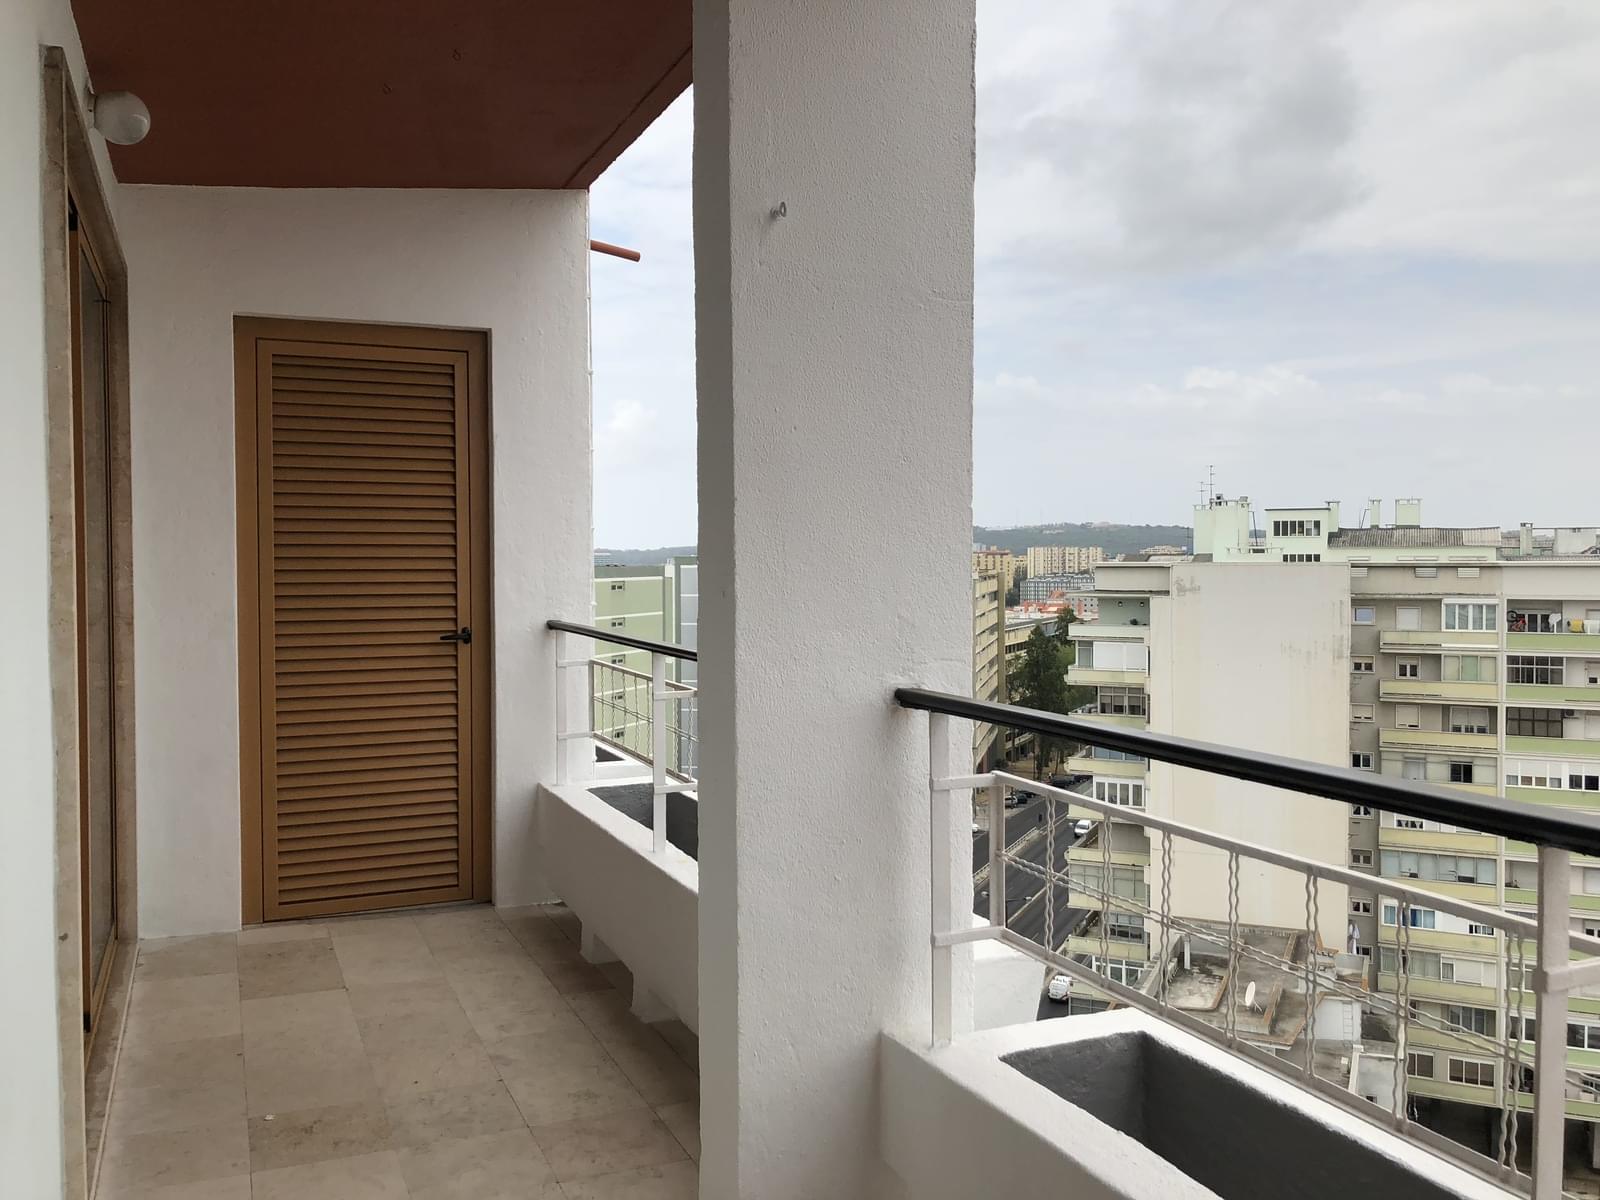 pf18040-apartamento-t3-lisboa-eac5592c-3f2b-42ab-adca-82c4c3f2181a